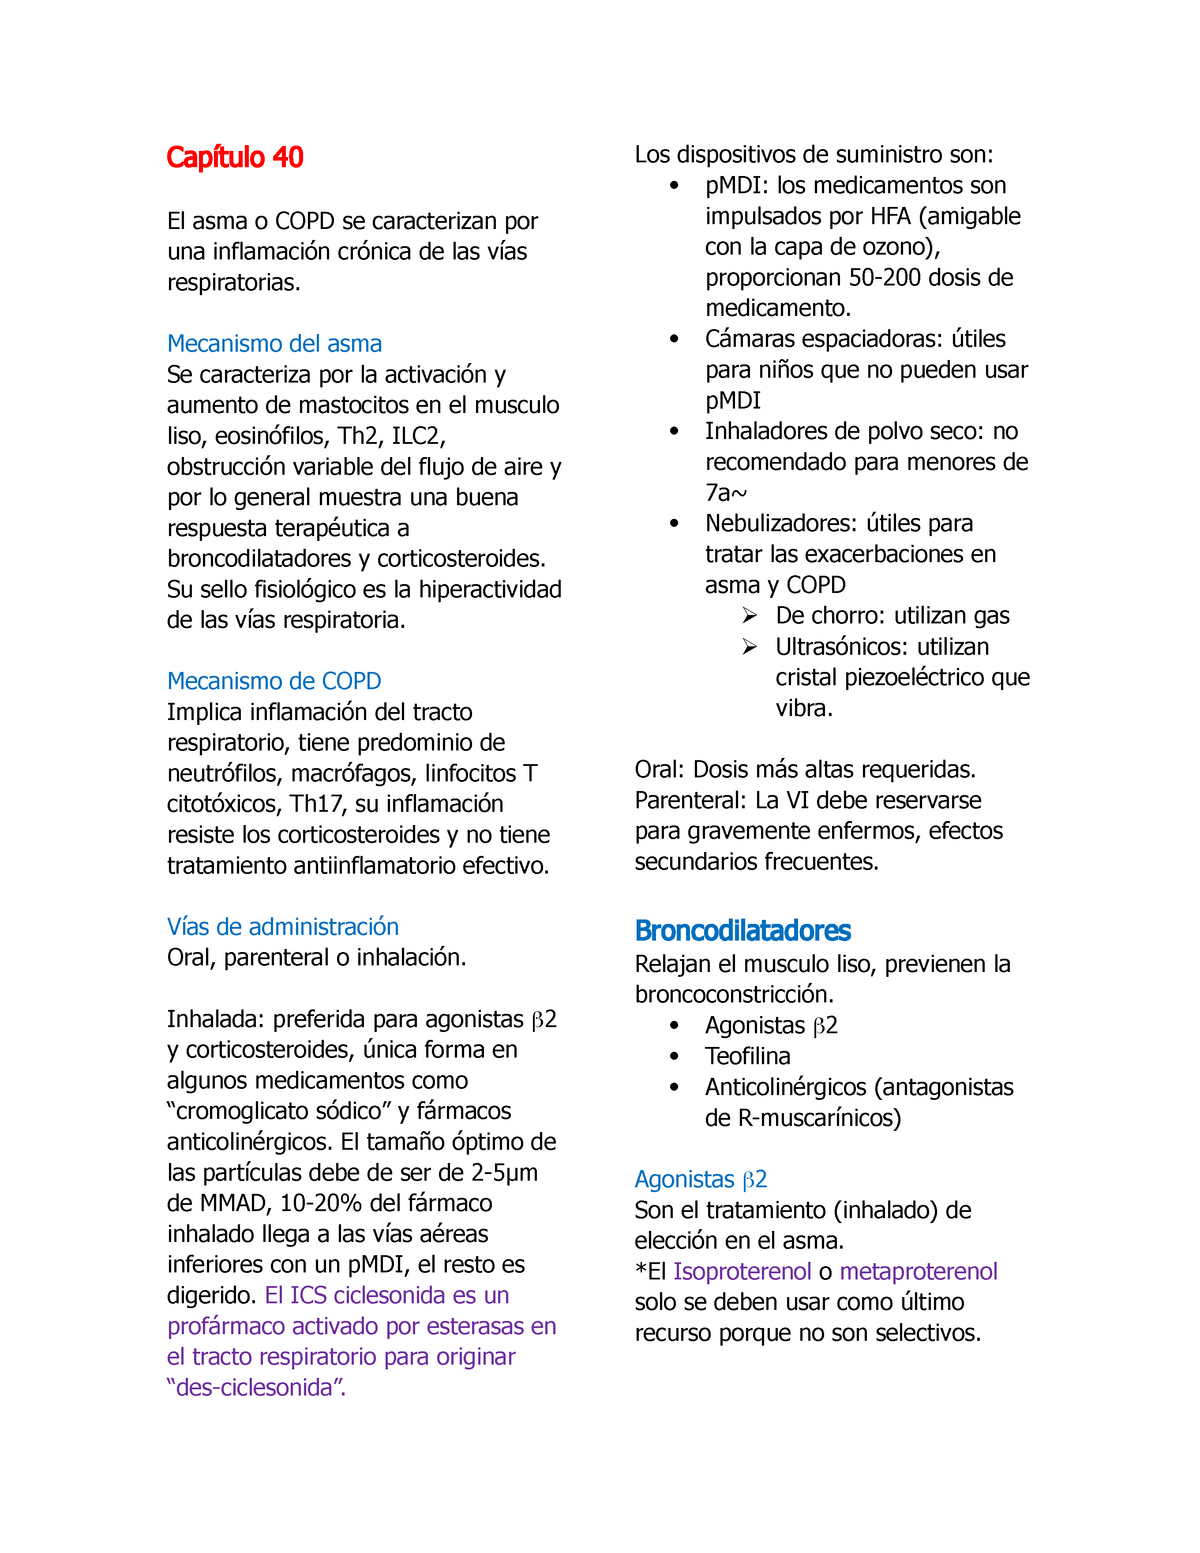 Resumen Farmacologia 2019 1 Farmacologia Clinica Fc2019 Studocu